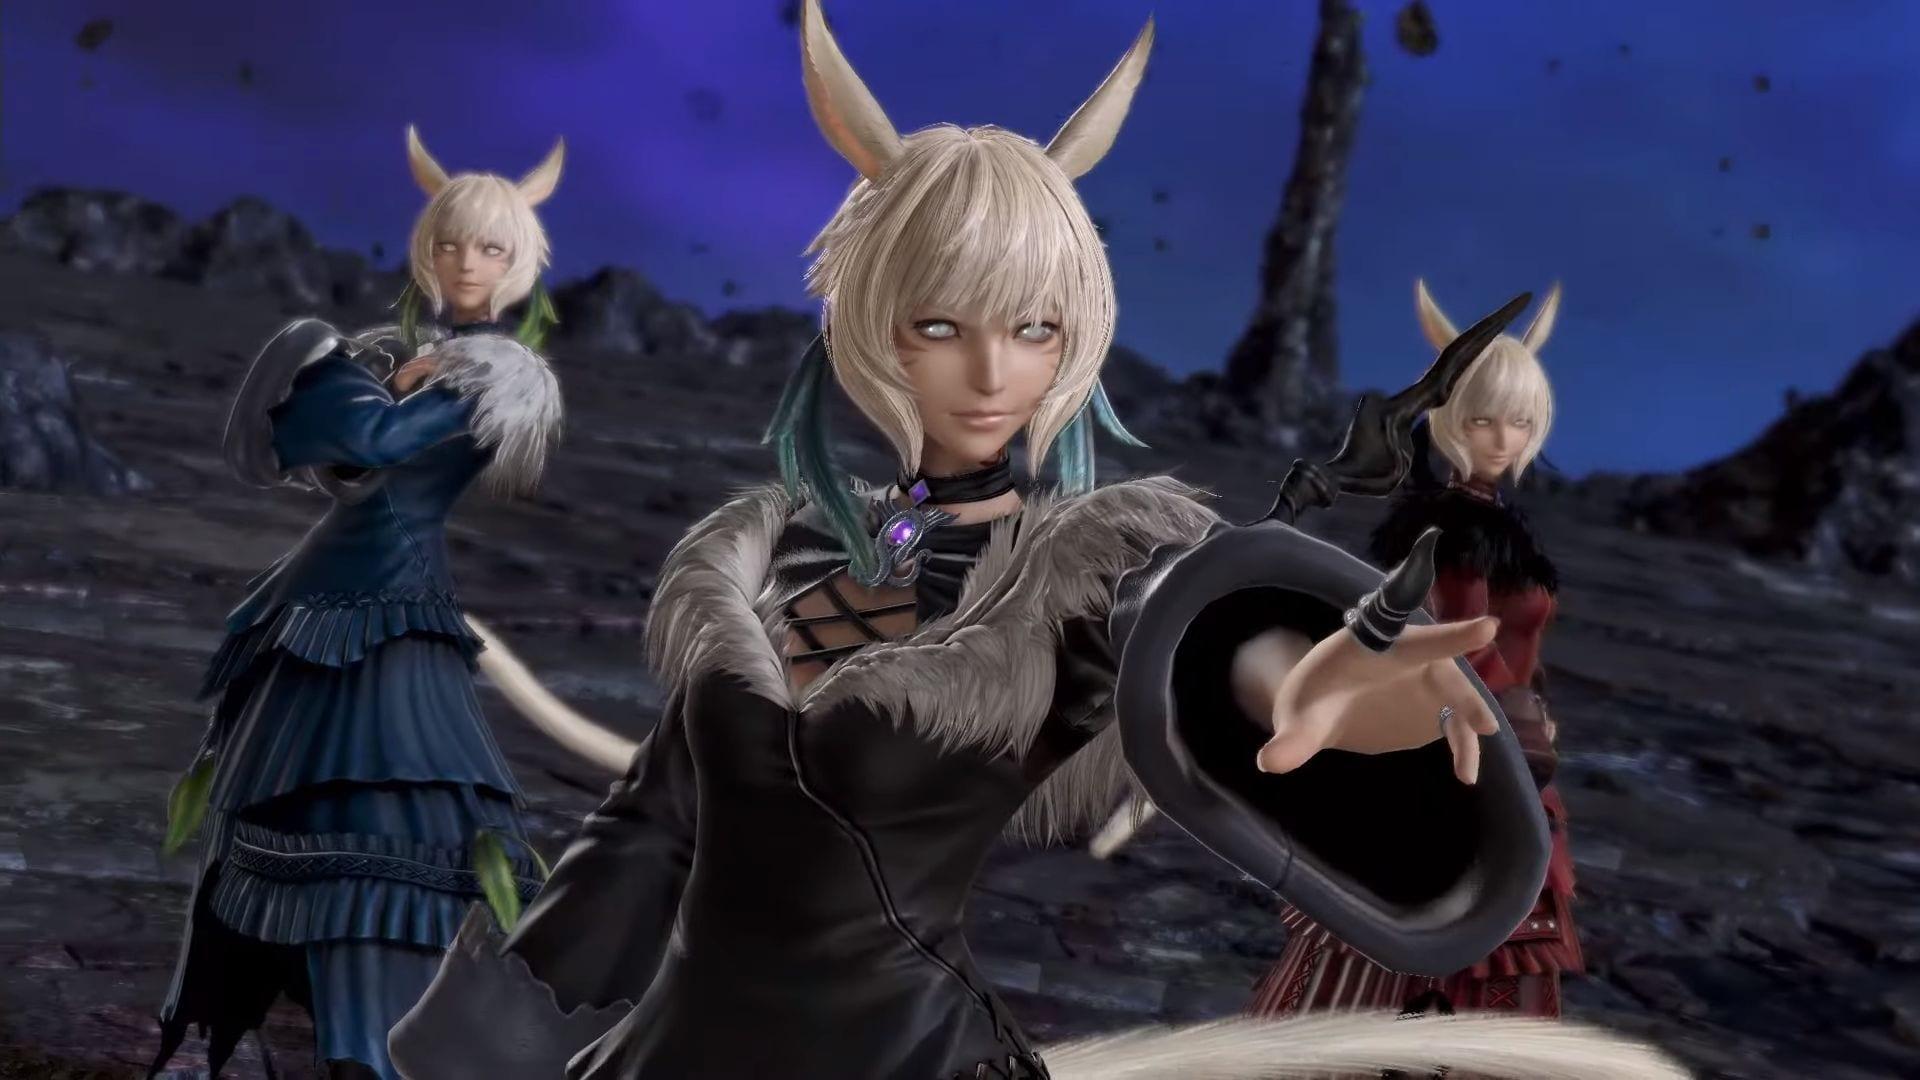 Y Shtola Getting Her Final Fantasy Xiv Shadowbringers Look In Dissidia Final Fantasy Nt